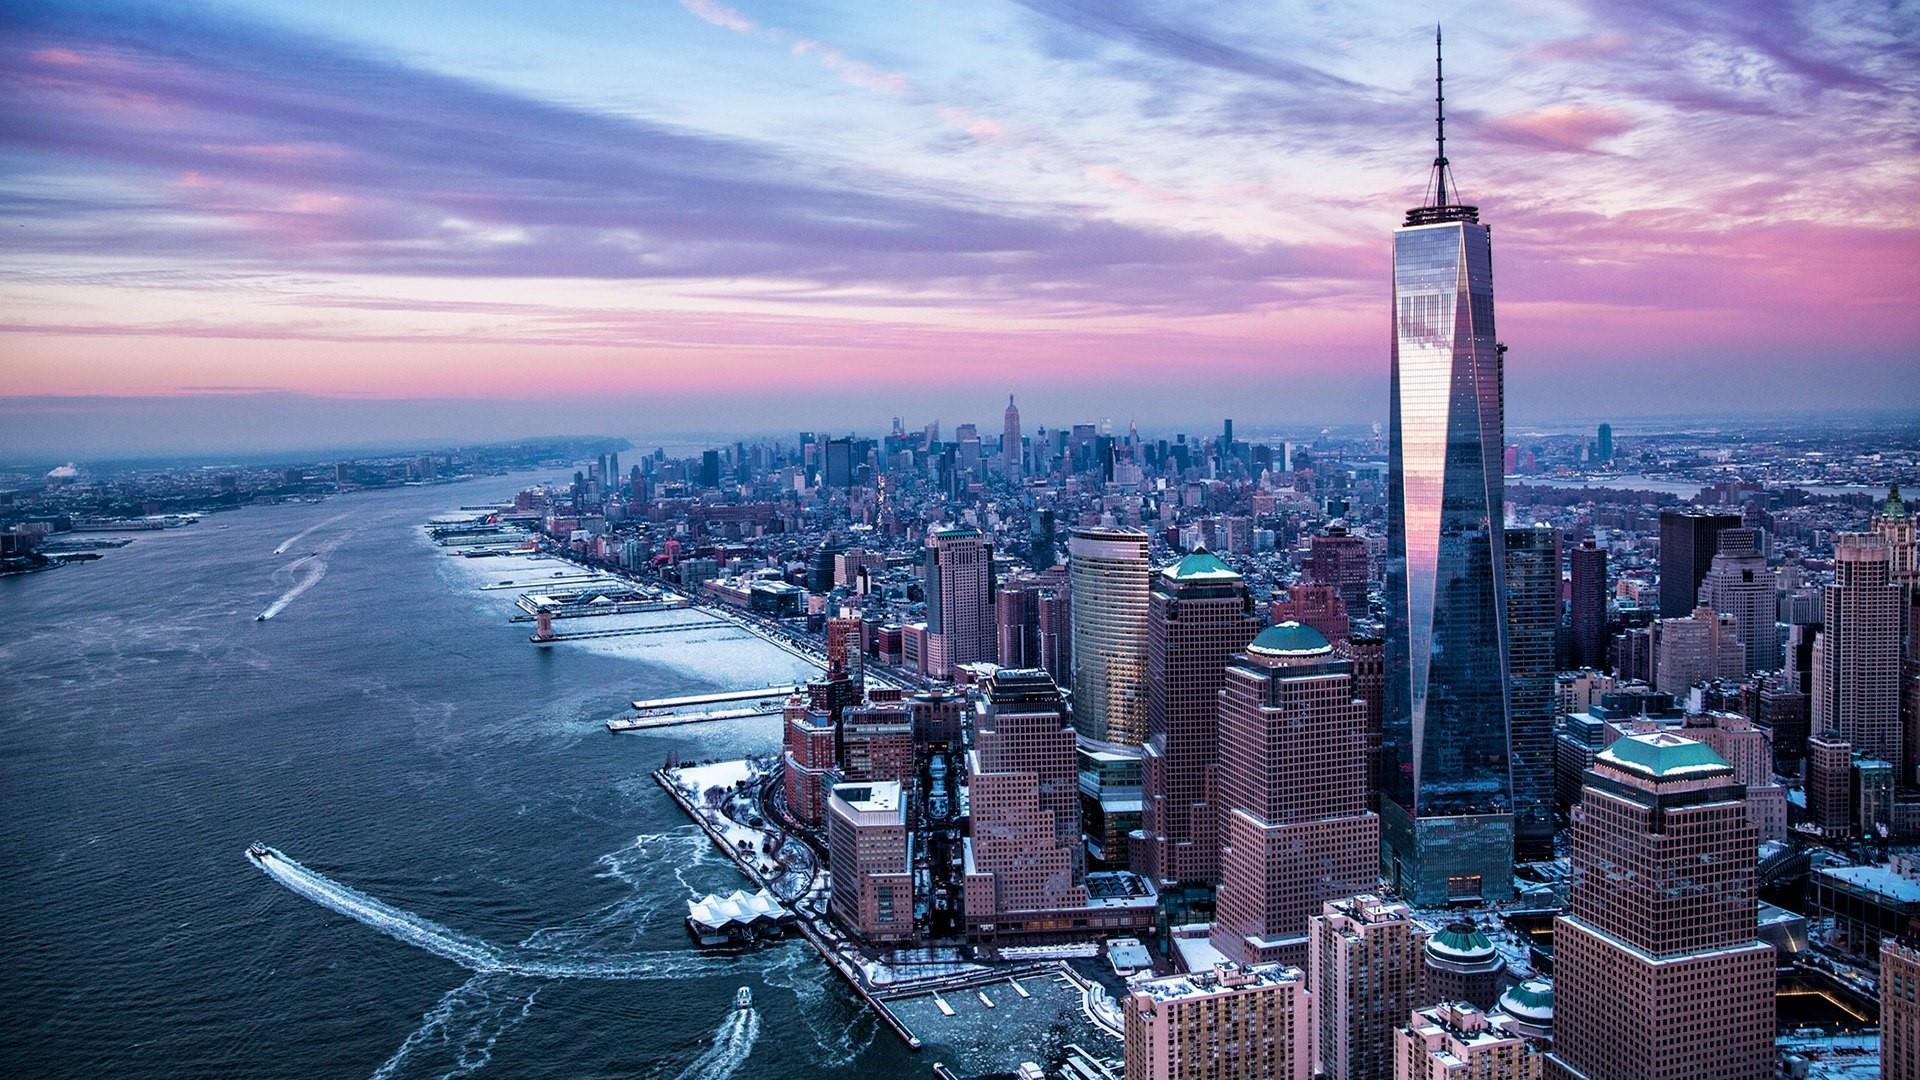 New York aerial view wallpaper